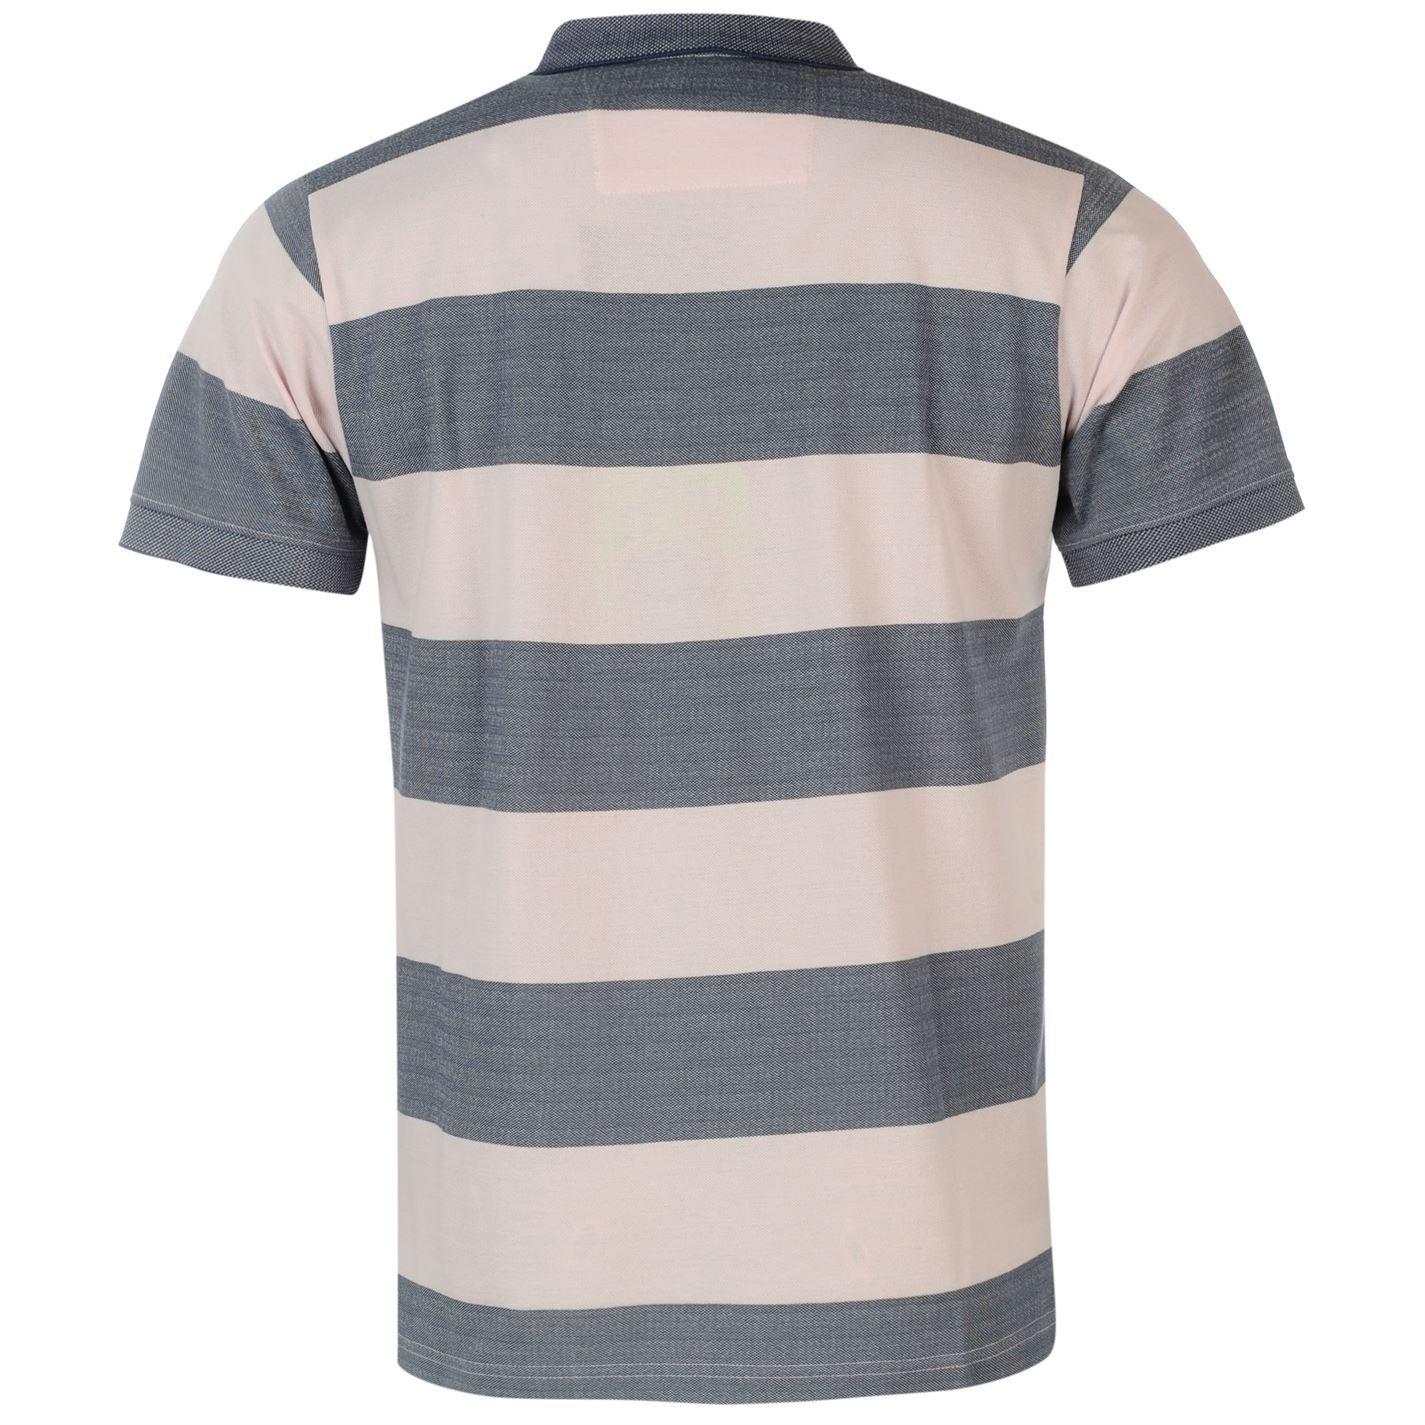 Pierre Cardin Hombre A Rayas Polo Camisa Camiseta Top Casual Manga ...